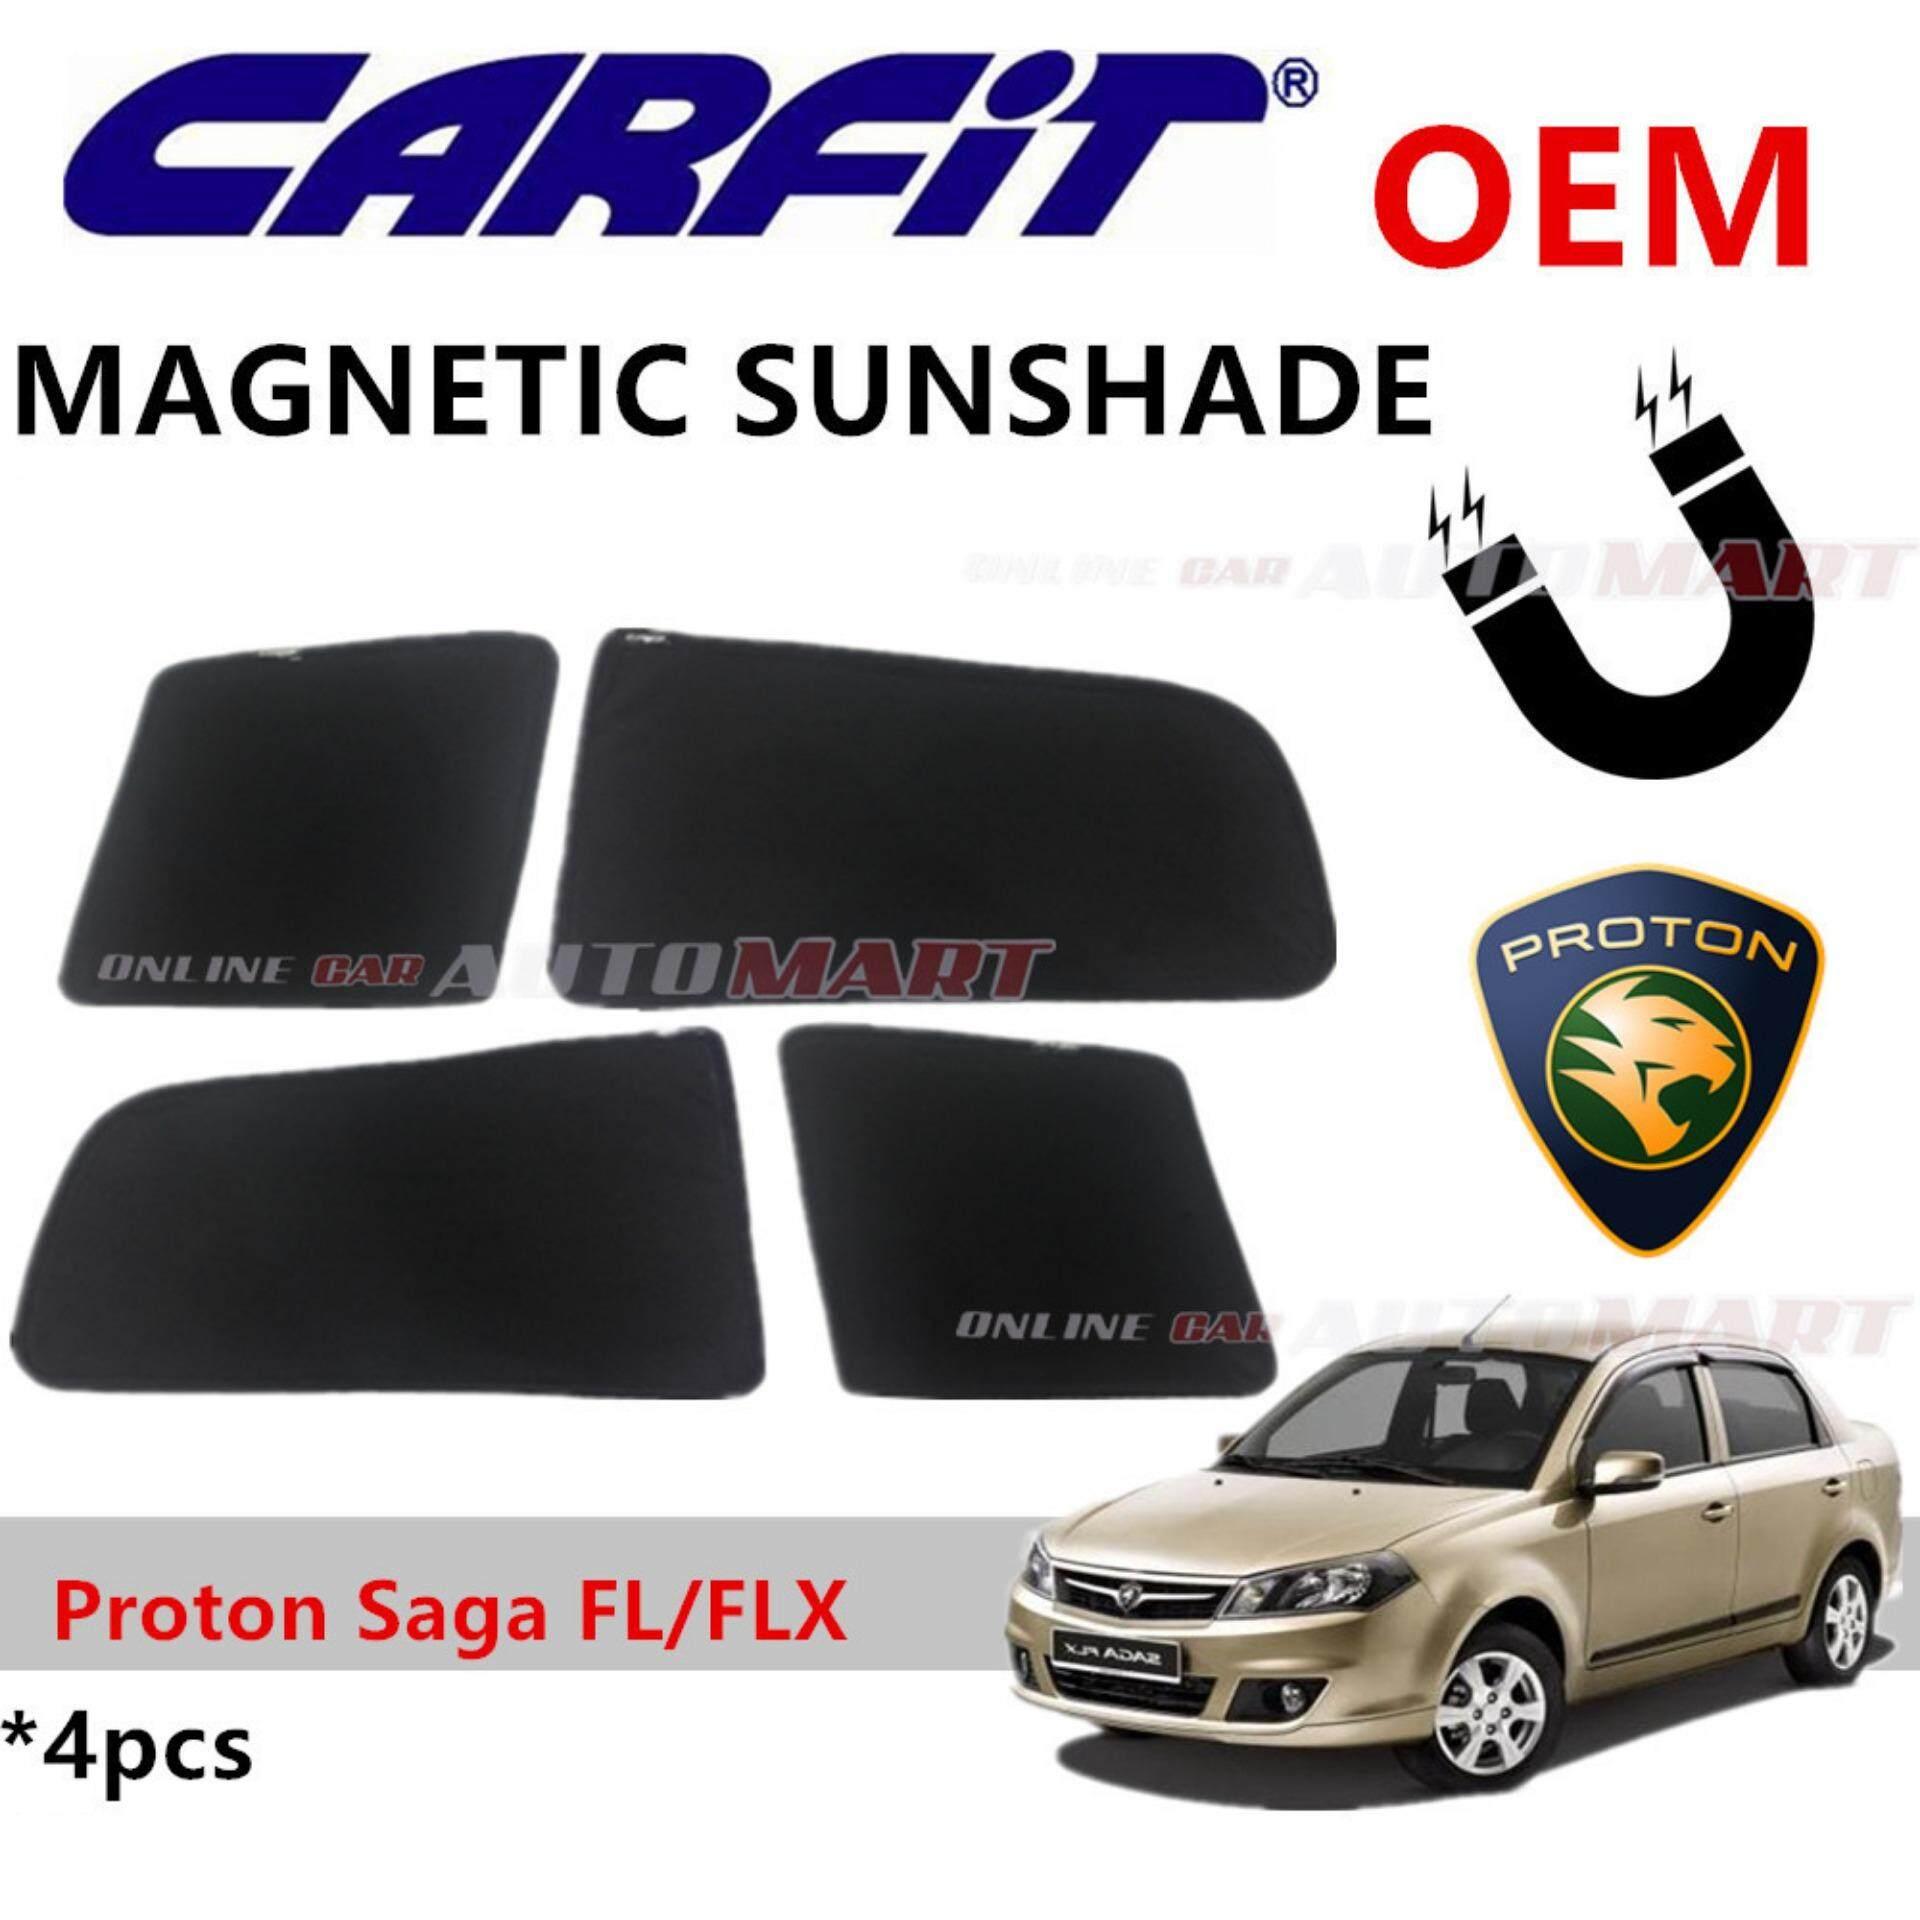 CARFIT OEM Magnetic Custom Fit Sunshade For Proton Saga FLX/FL(4pcs Sets)